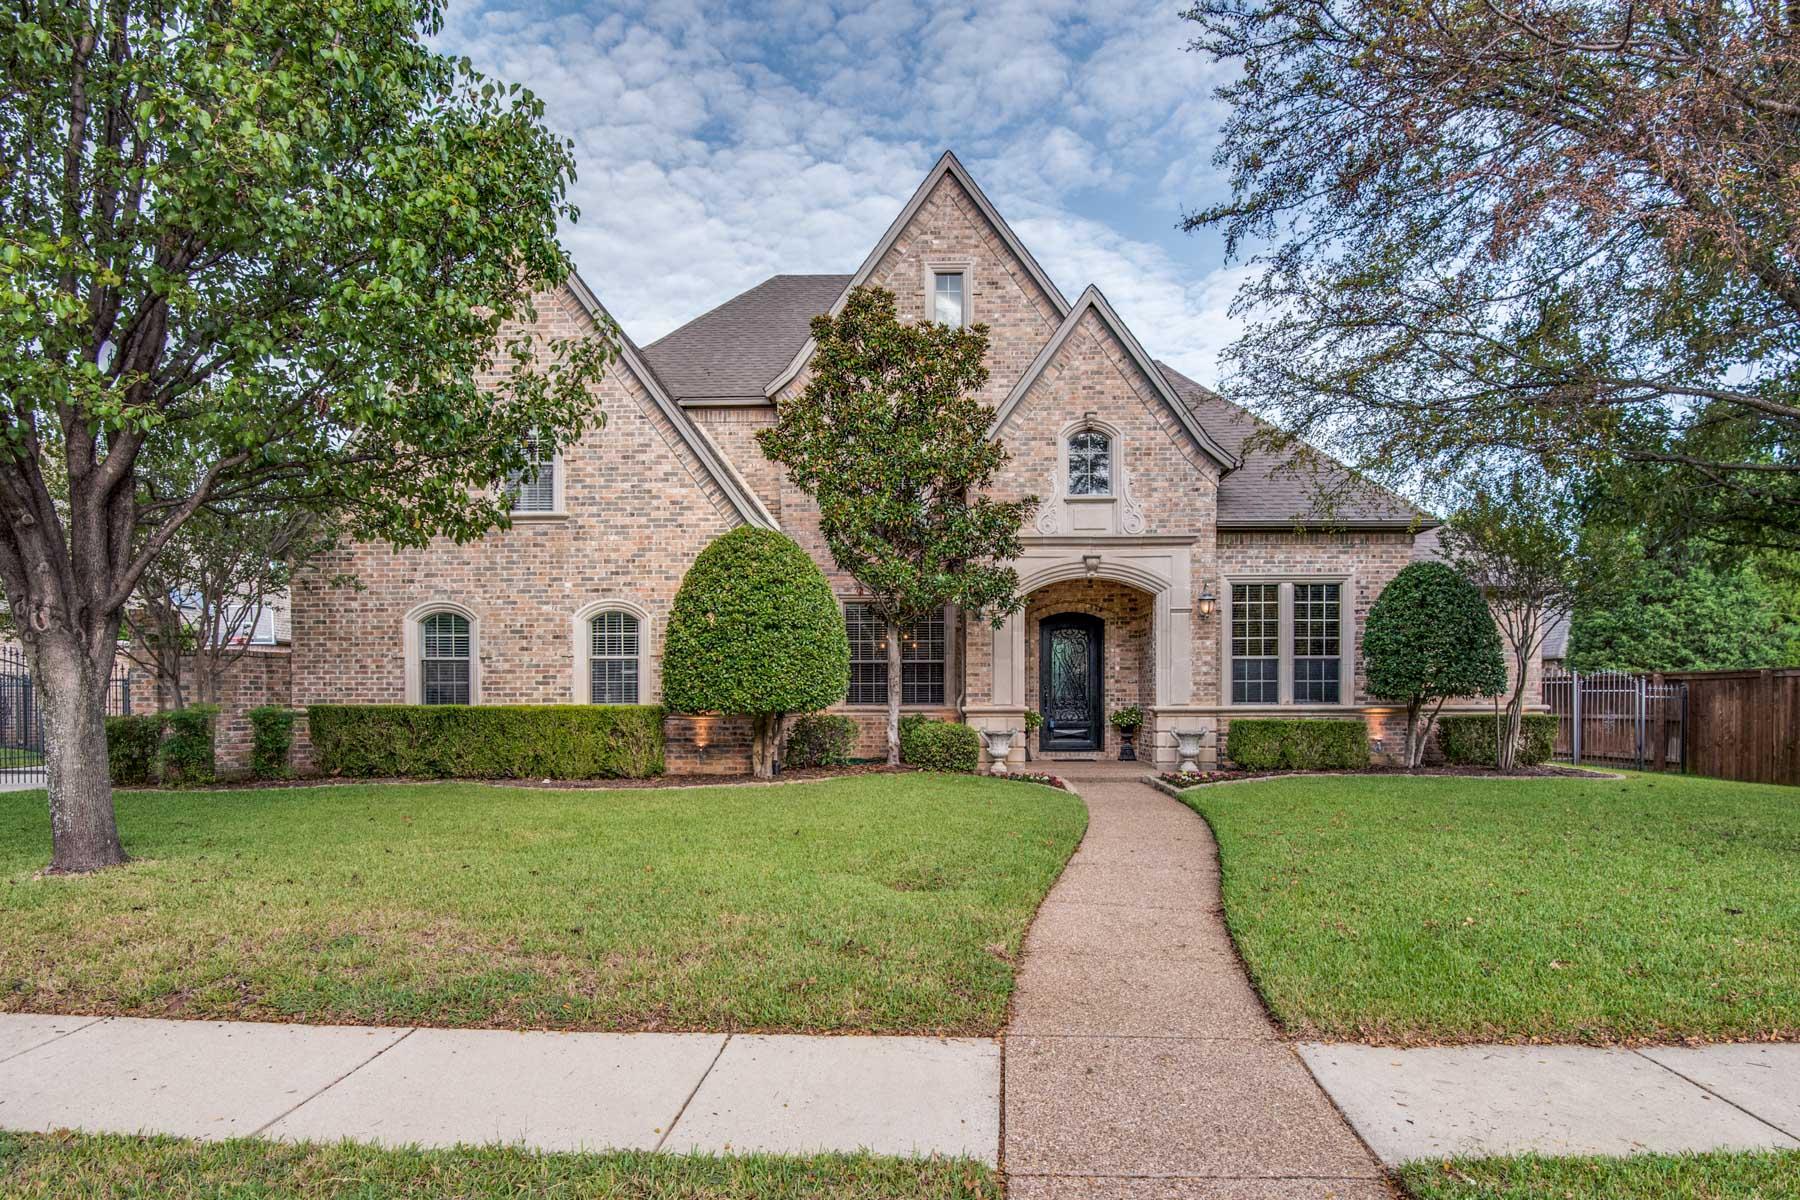 واحد منزل الأسرة للـ Sale في Gorgeous Colleyville Custom Home 7003 Shepherds Glen, Colleyville, Texas, 76034 United States